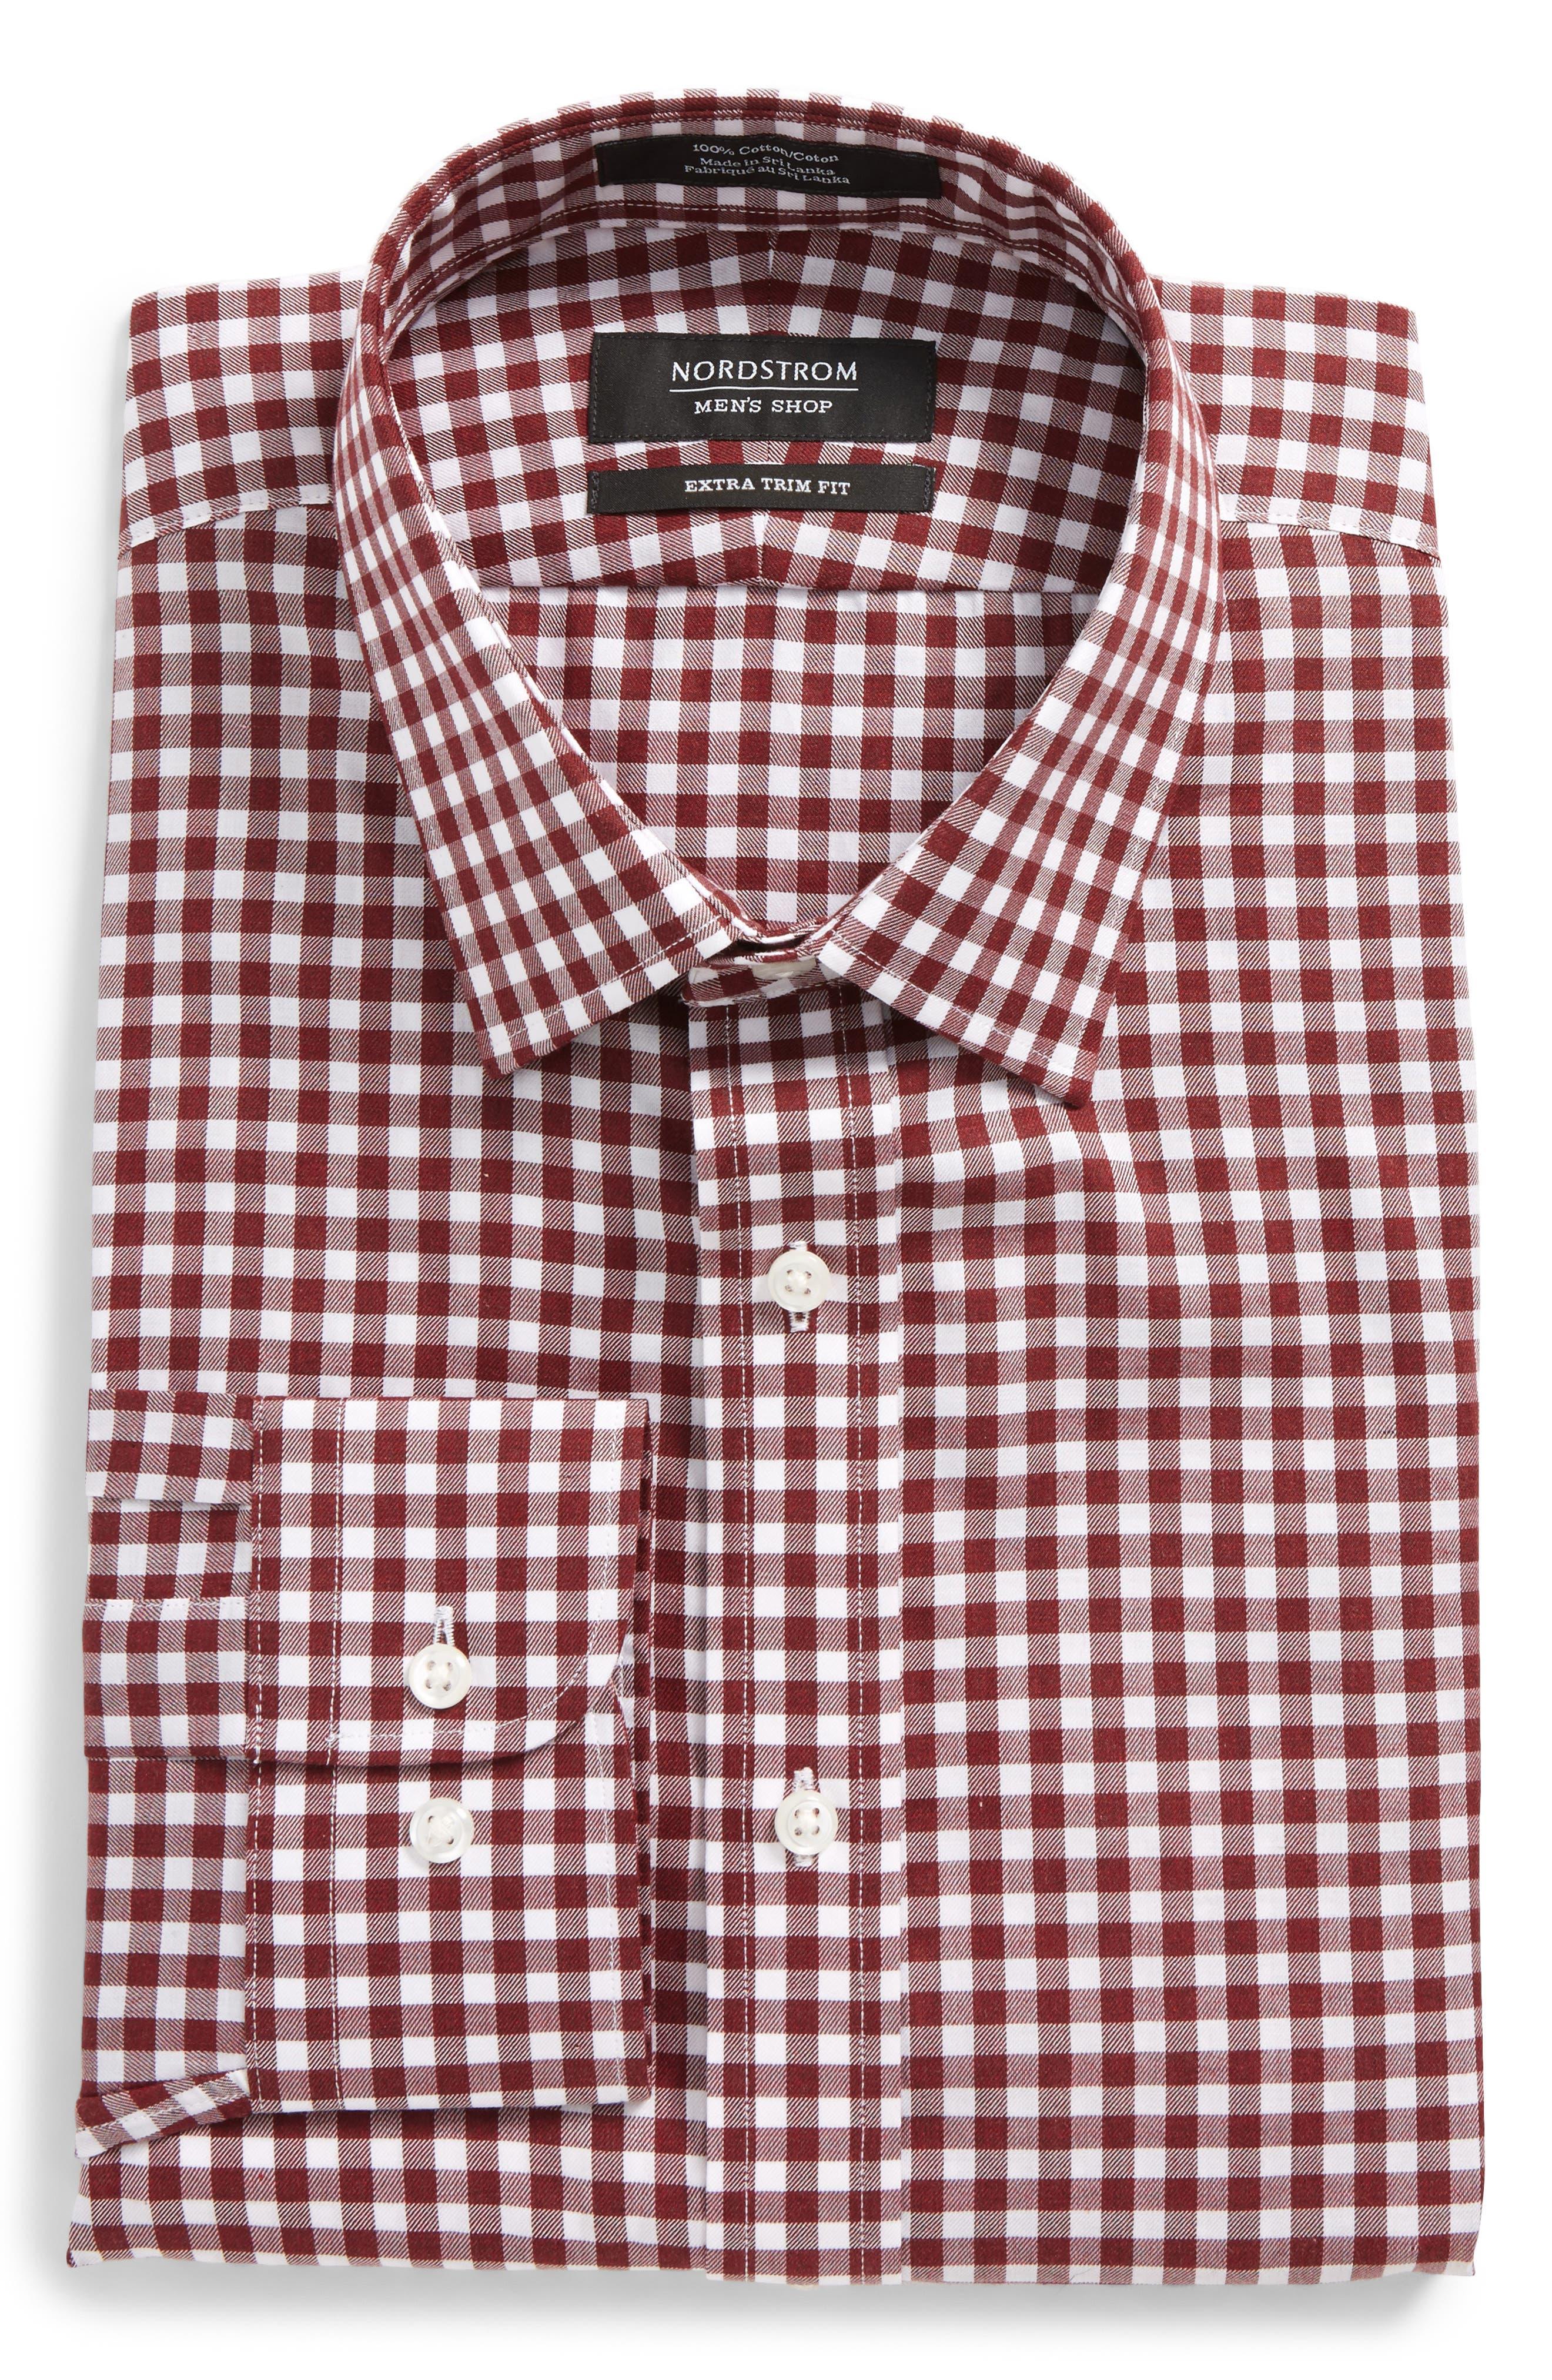 Alternate Image 1 Selected - Nordstrom Men's Shop Extra Trim Fit Check Dress Shirt